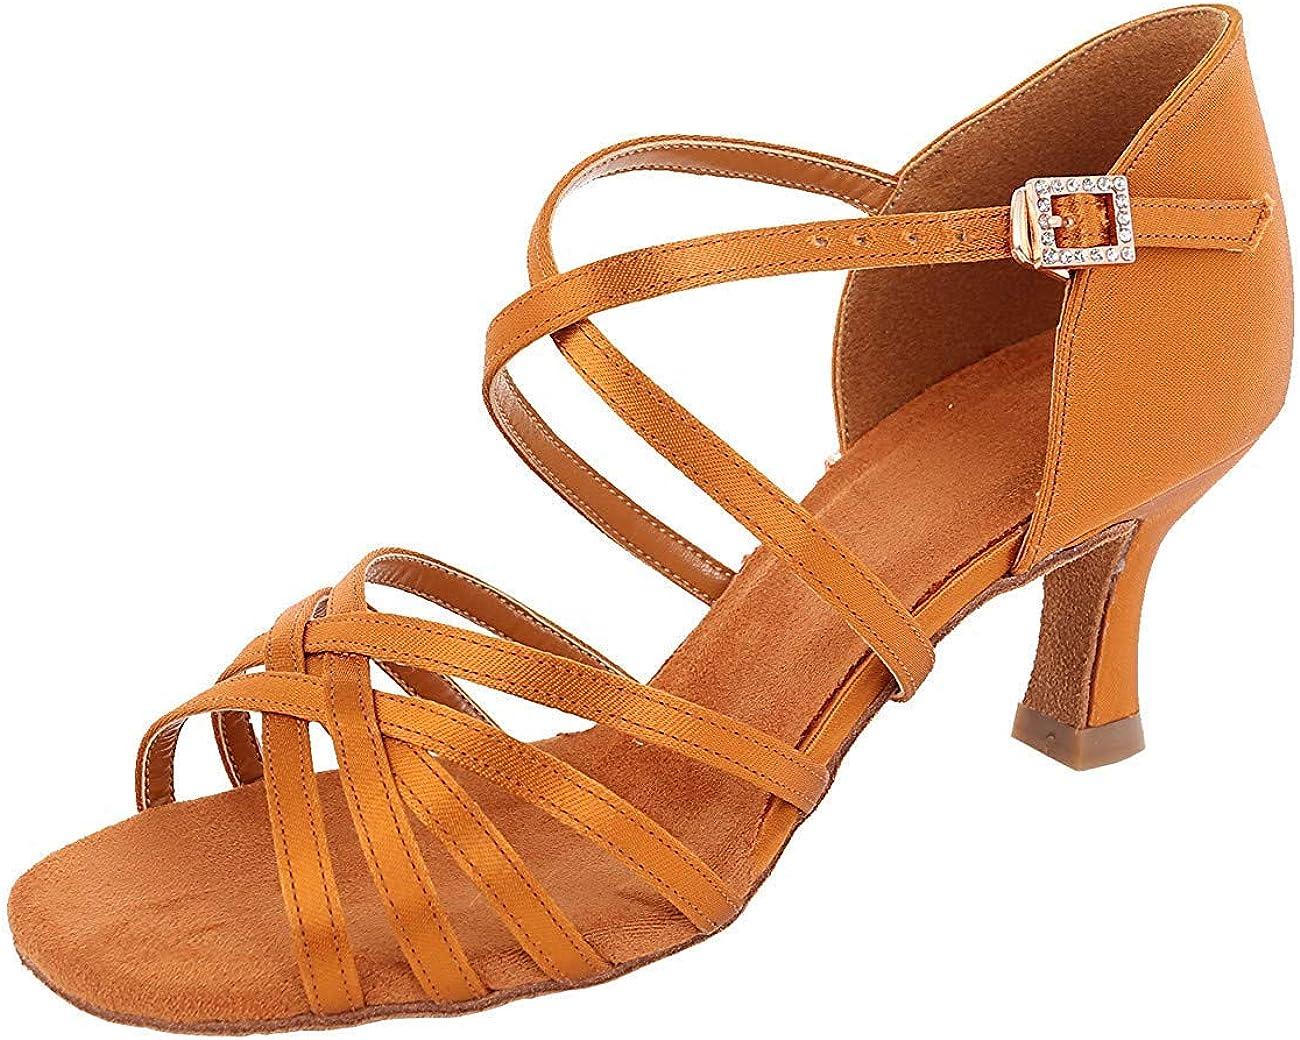 Womens Ballroom Regular dealer Dance Shoes Classic Tango Latin Salsa sale Satin Danc